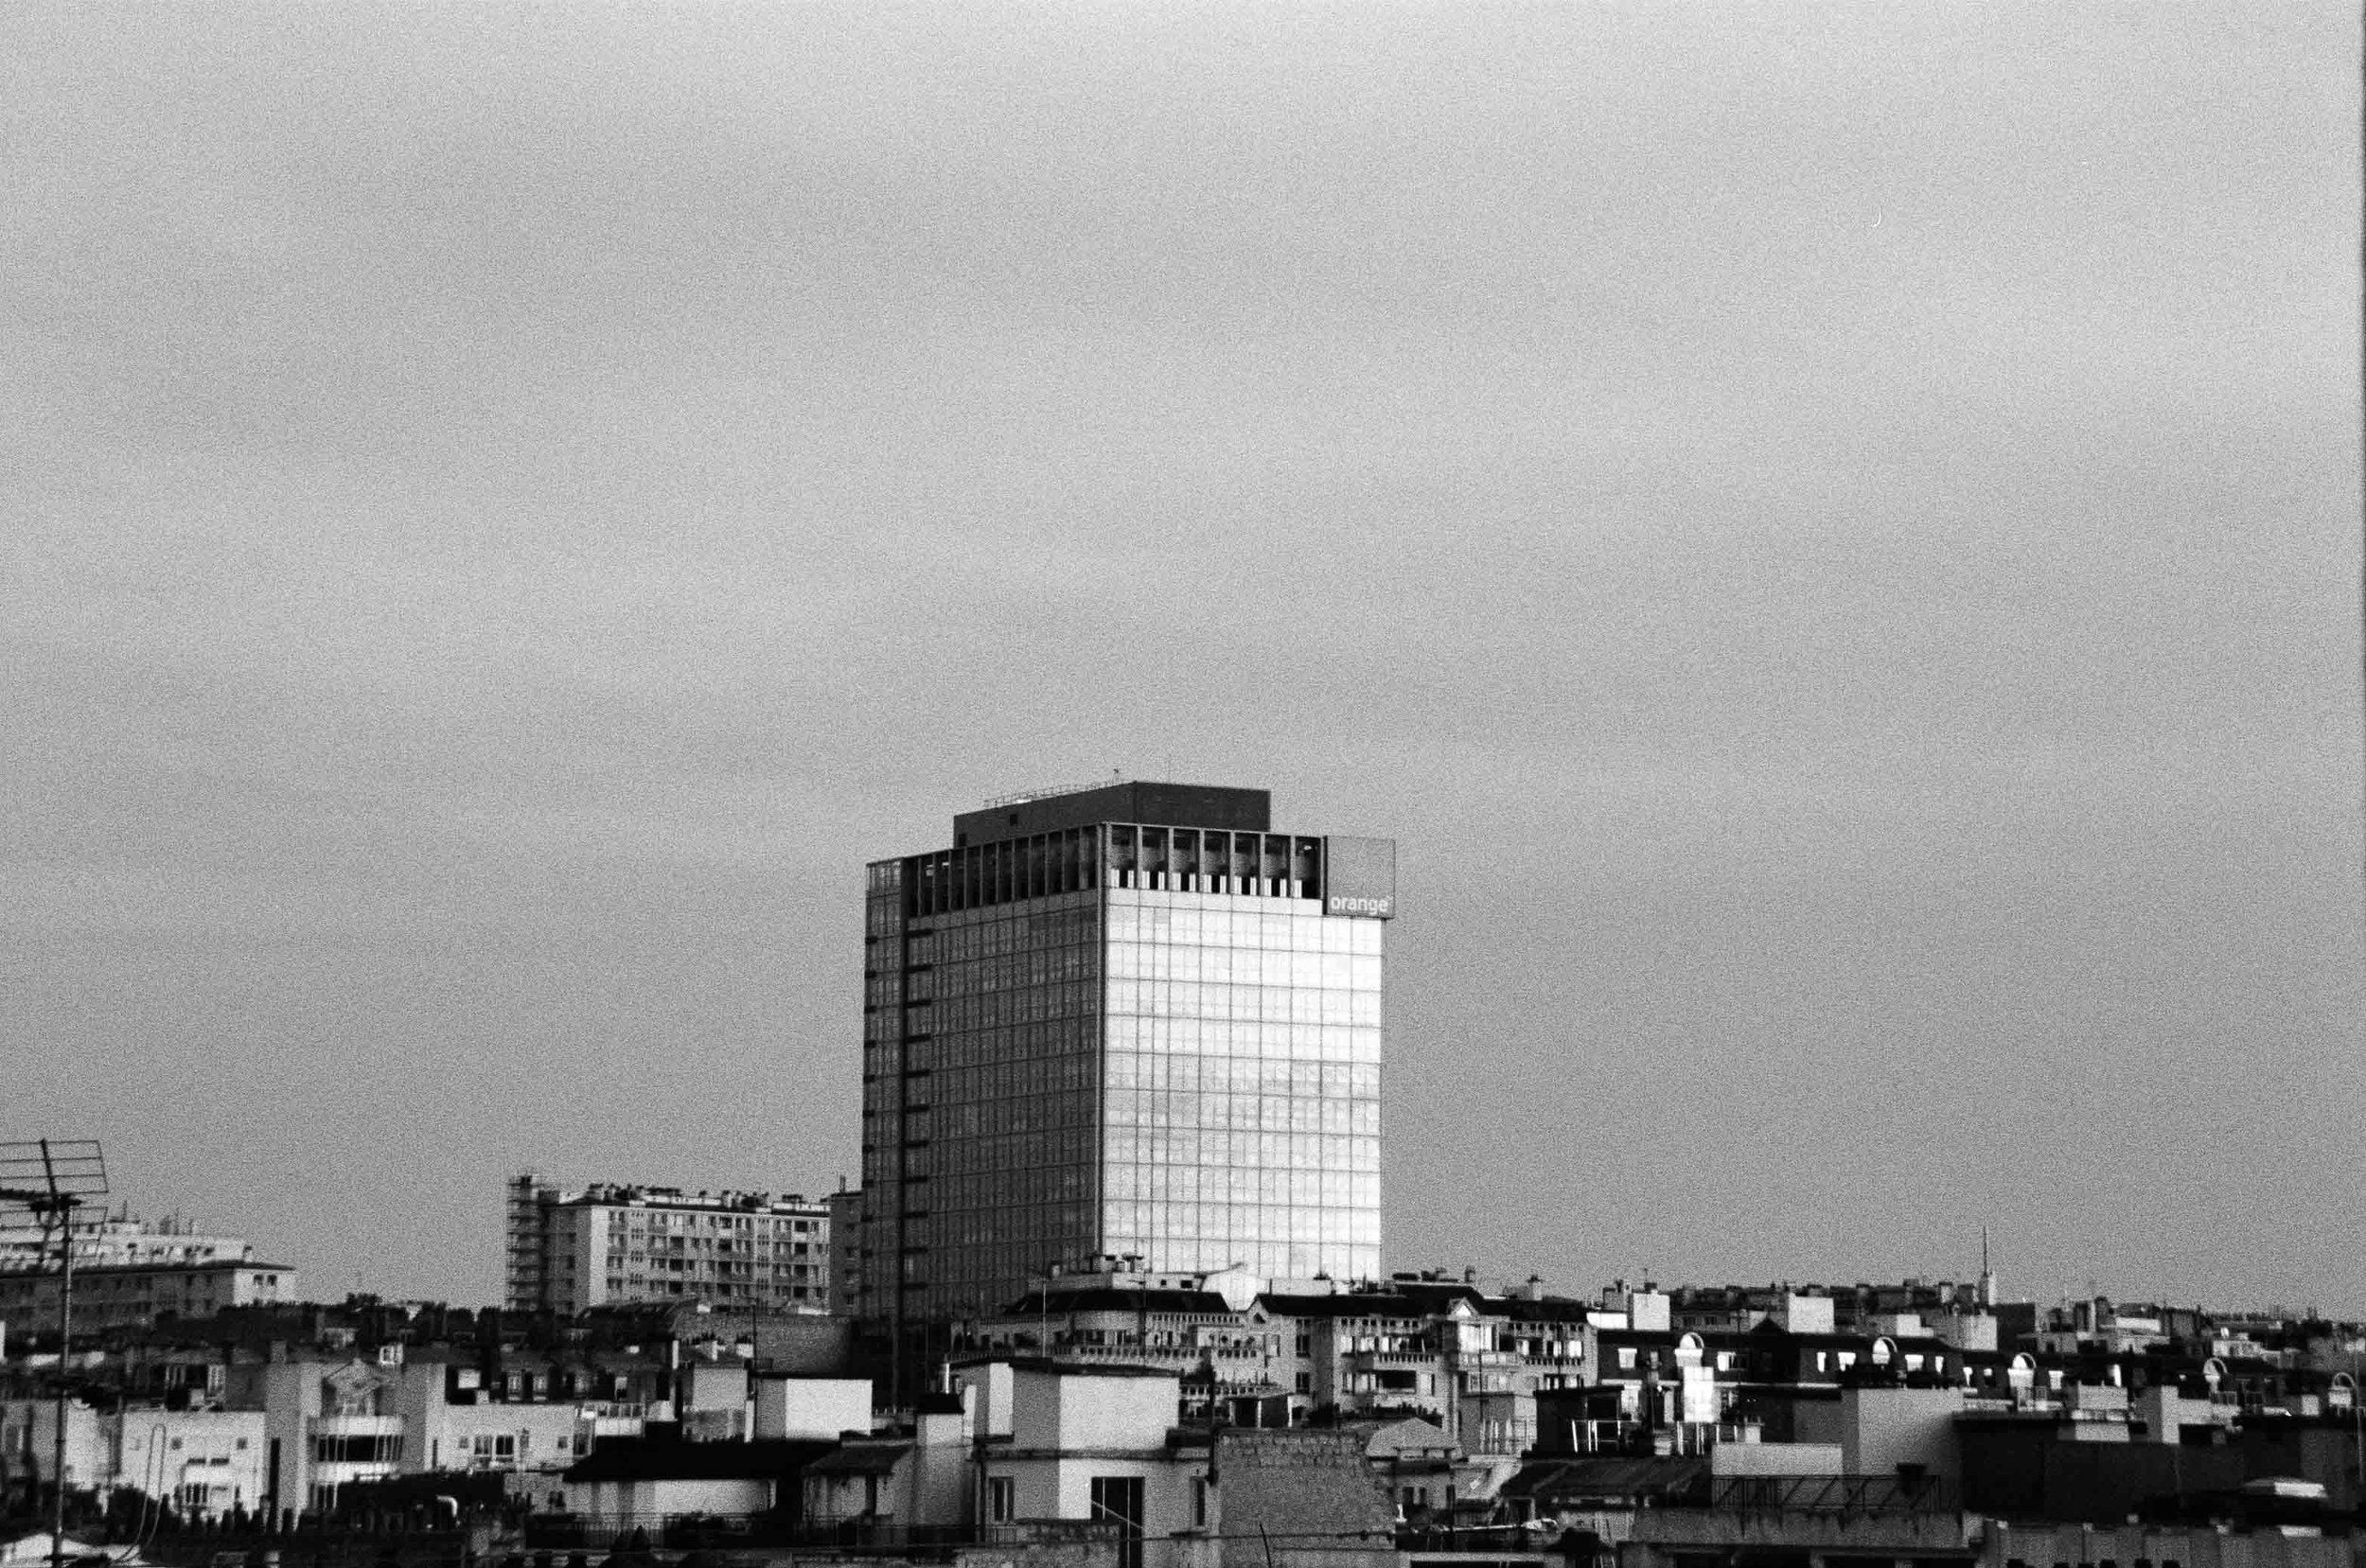 ChristosVourlis_photography_CVHAIR_CVDIARY_personal diary__film_35mm_0014_###.jpg